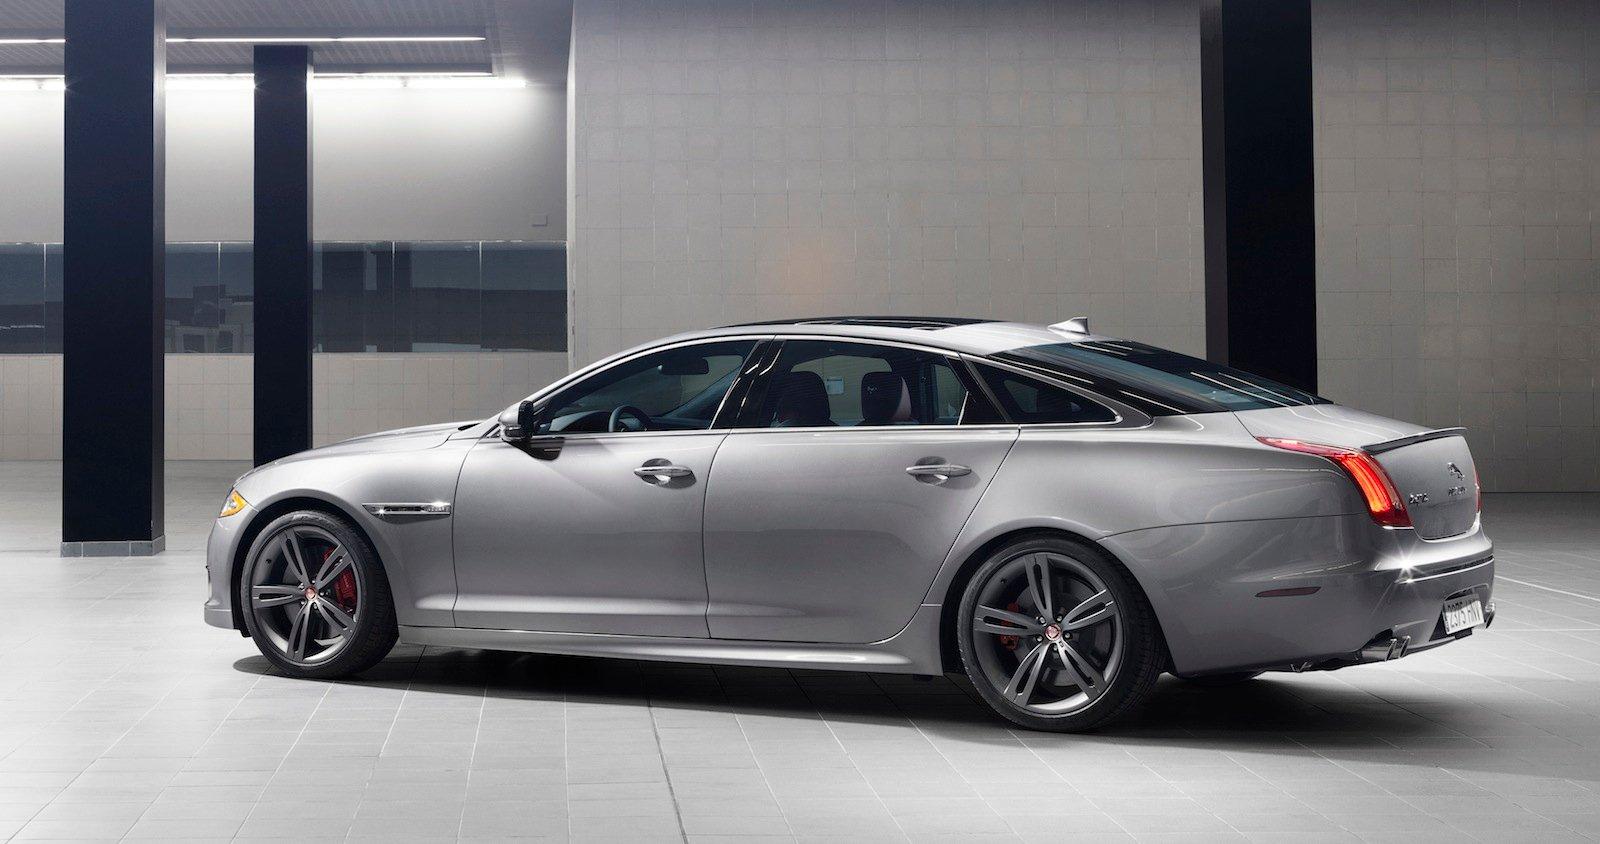 Jaguar XJR: high-performance luxury flagship returns - photos | CarAdvice